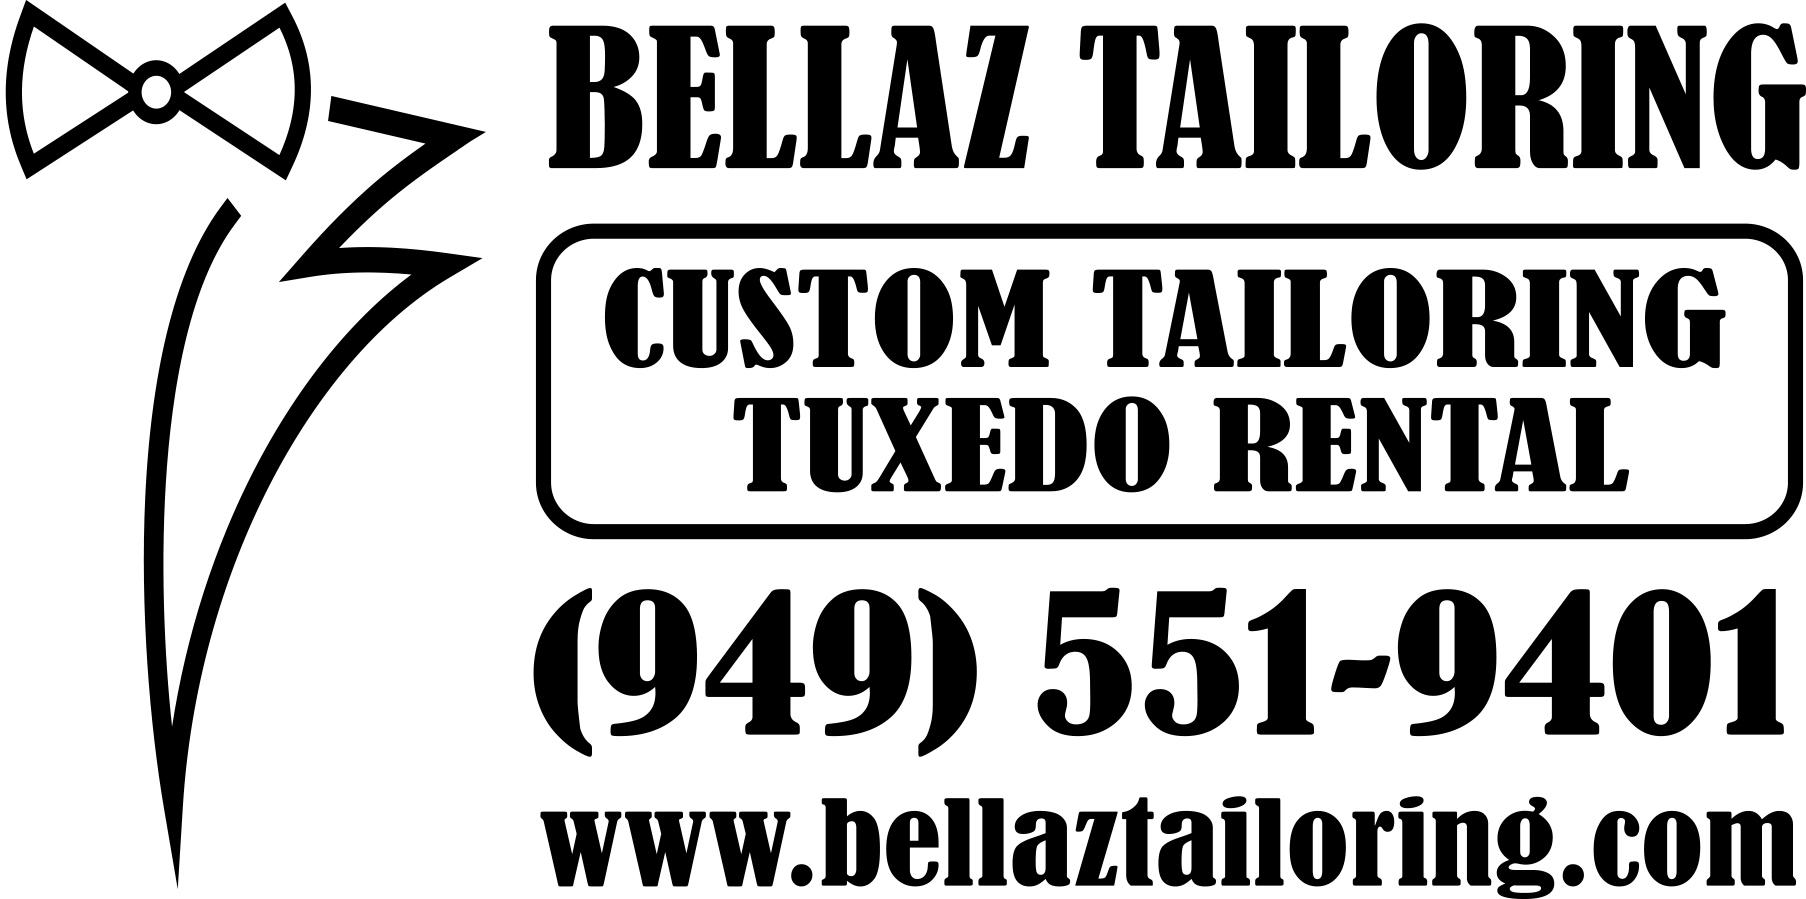 Bellaz Tailoring and Tuxedo Rental